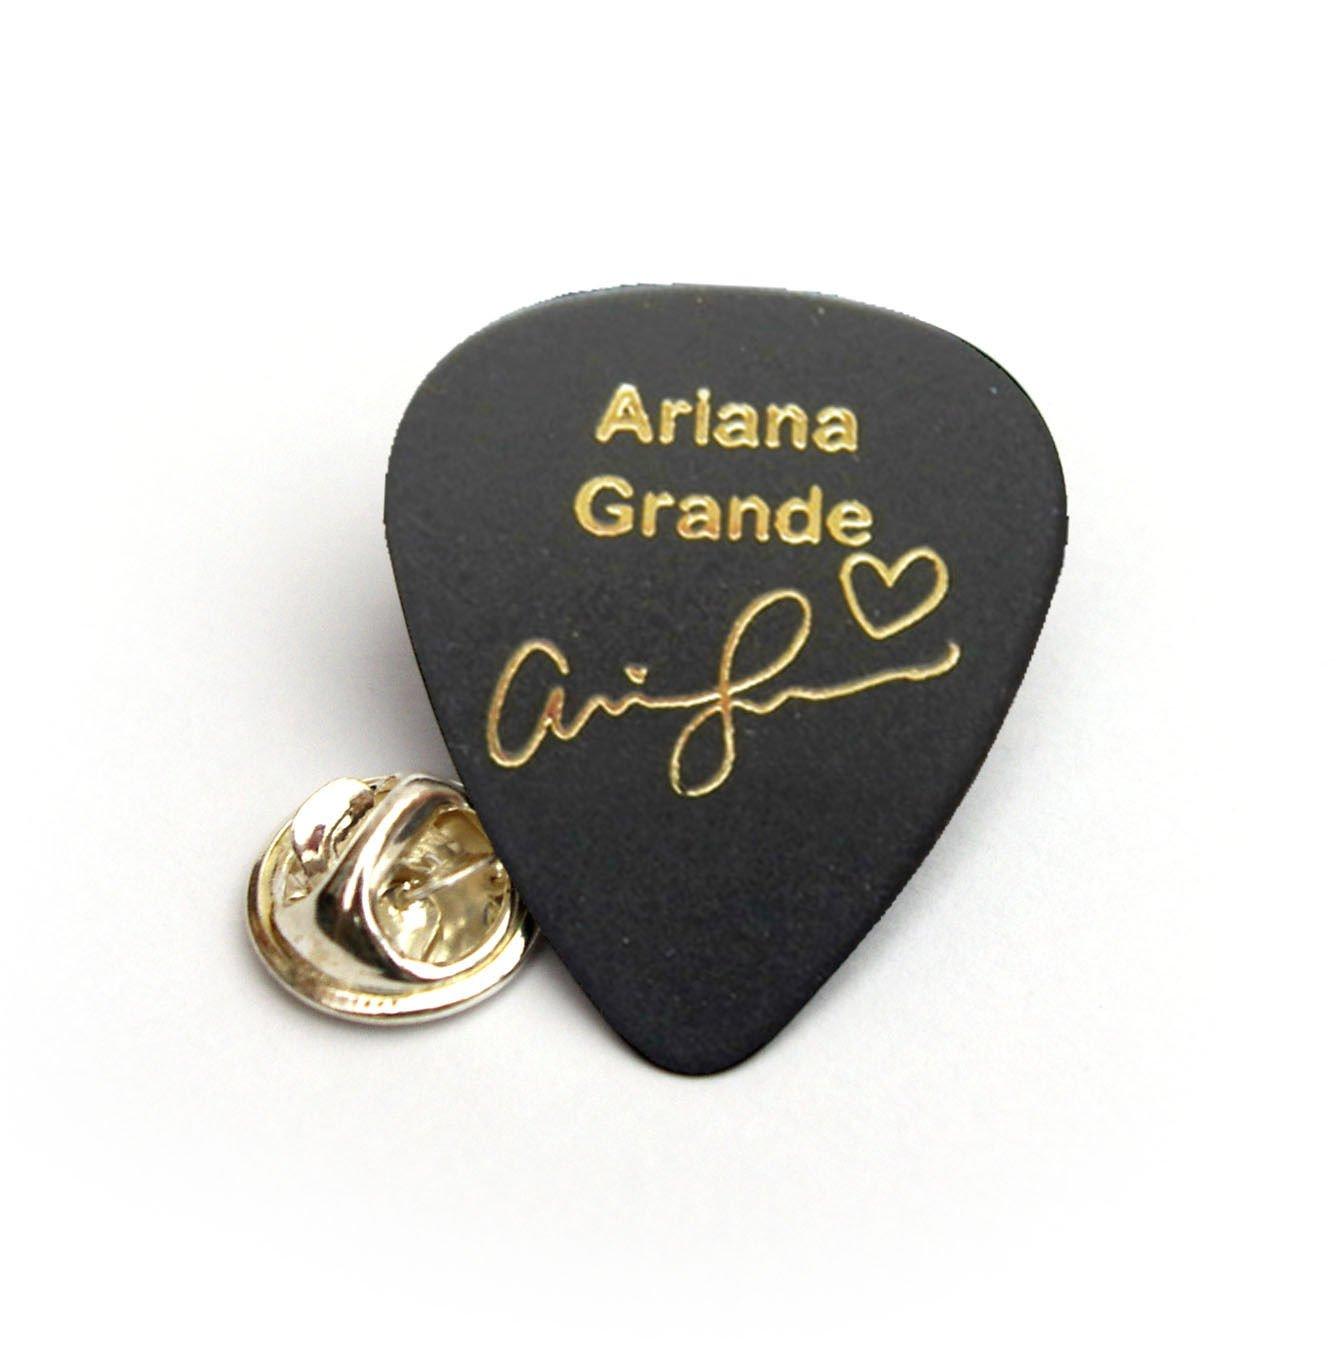 Ariana Grande Firma púa de guitarra Plectrum llavero pulsera ...